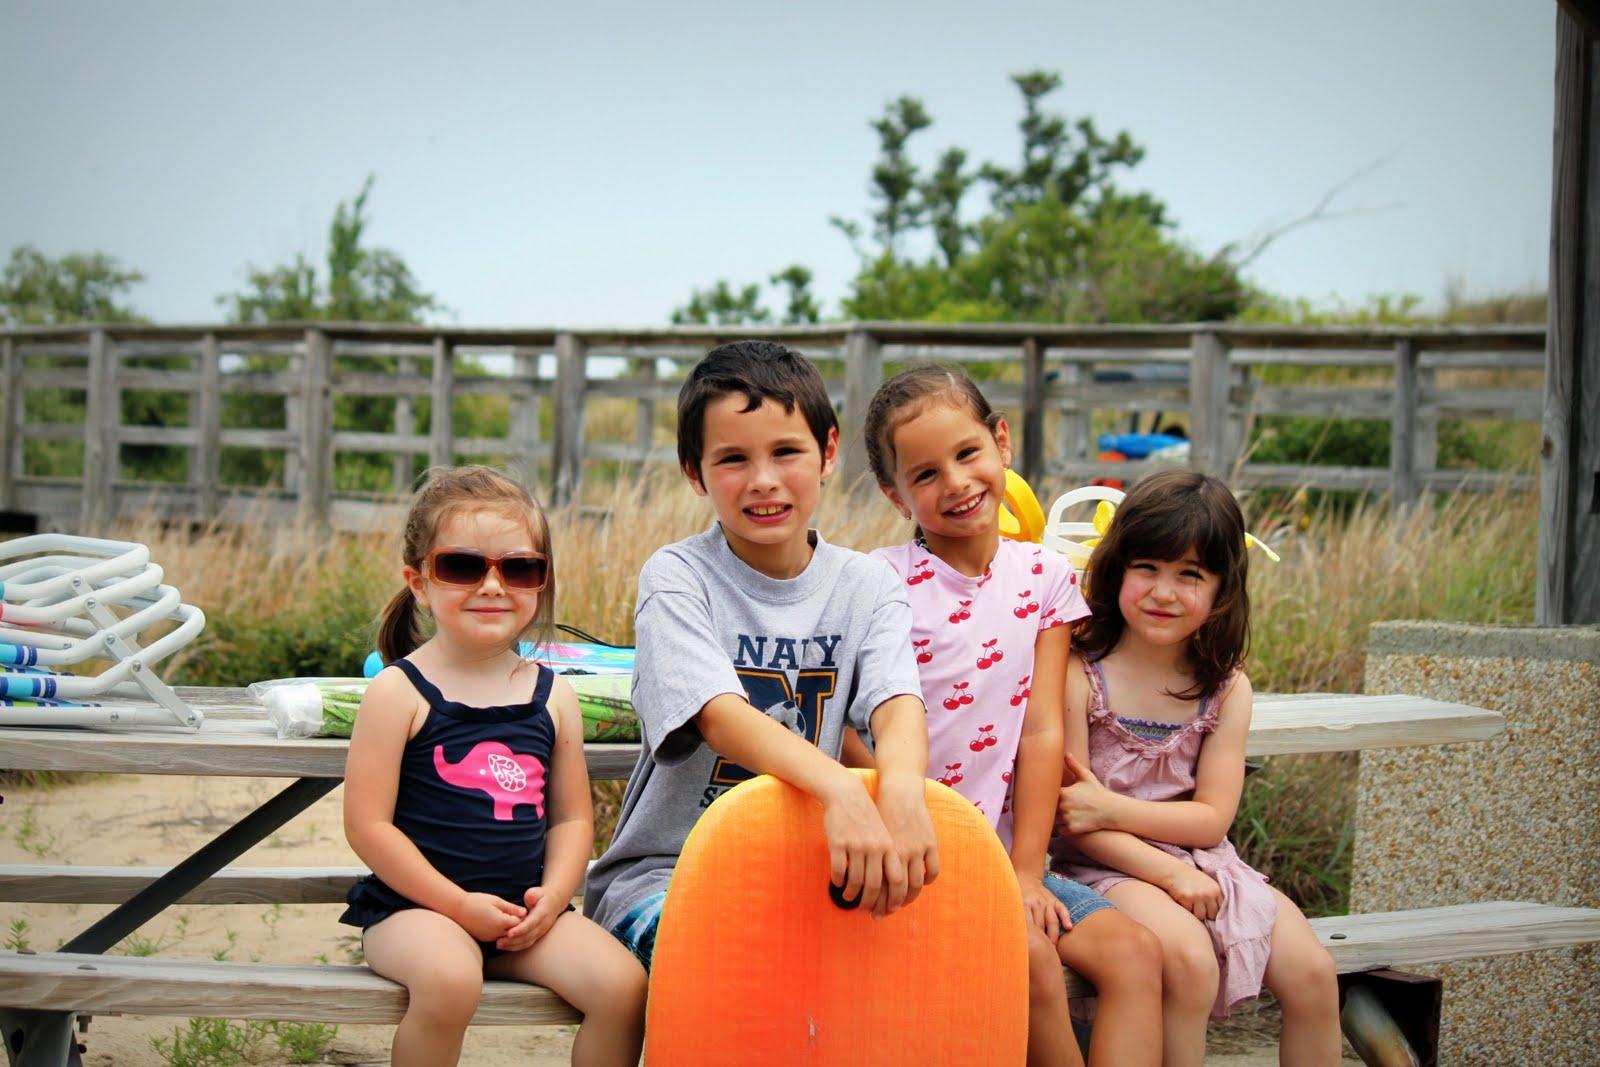 Eidsness Family Blog: Disney World Trip